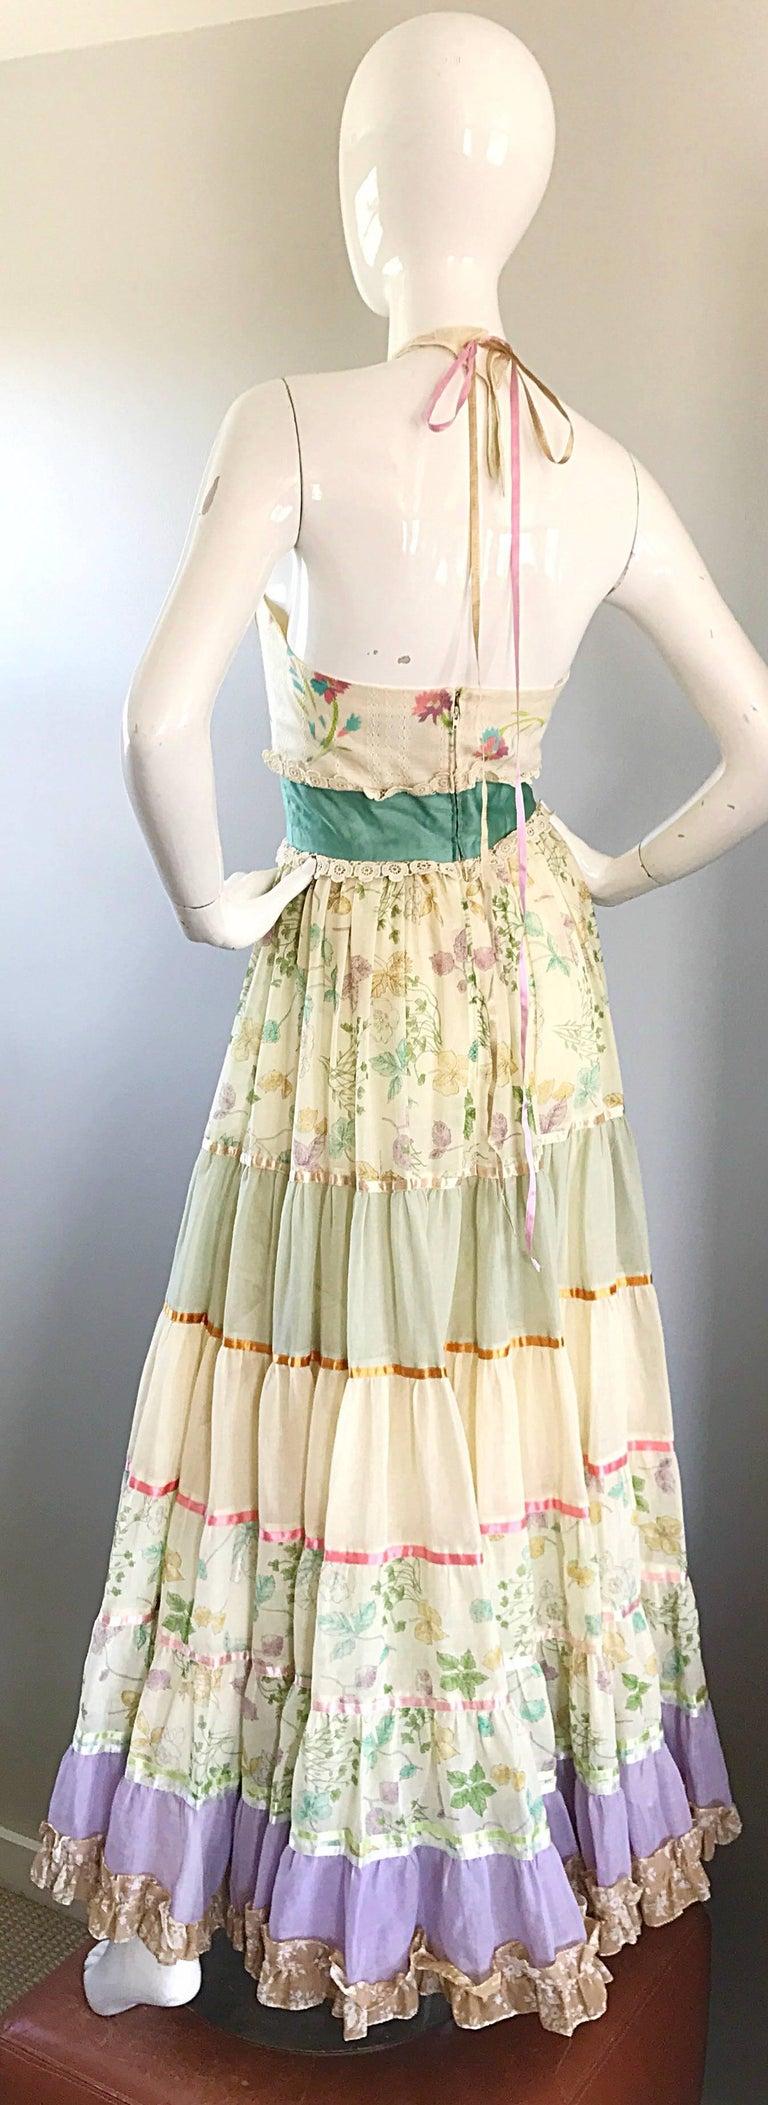 Giorgio di Sant Angelo Colorful Cotton Voile 70s Couture Maxi Dress Gown  For Sale 1